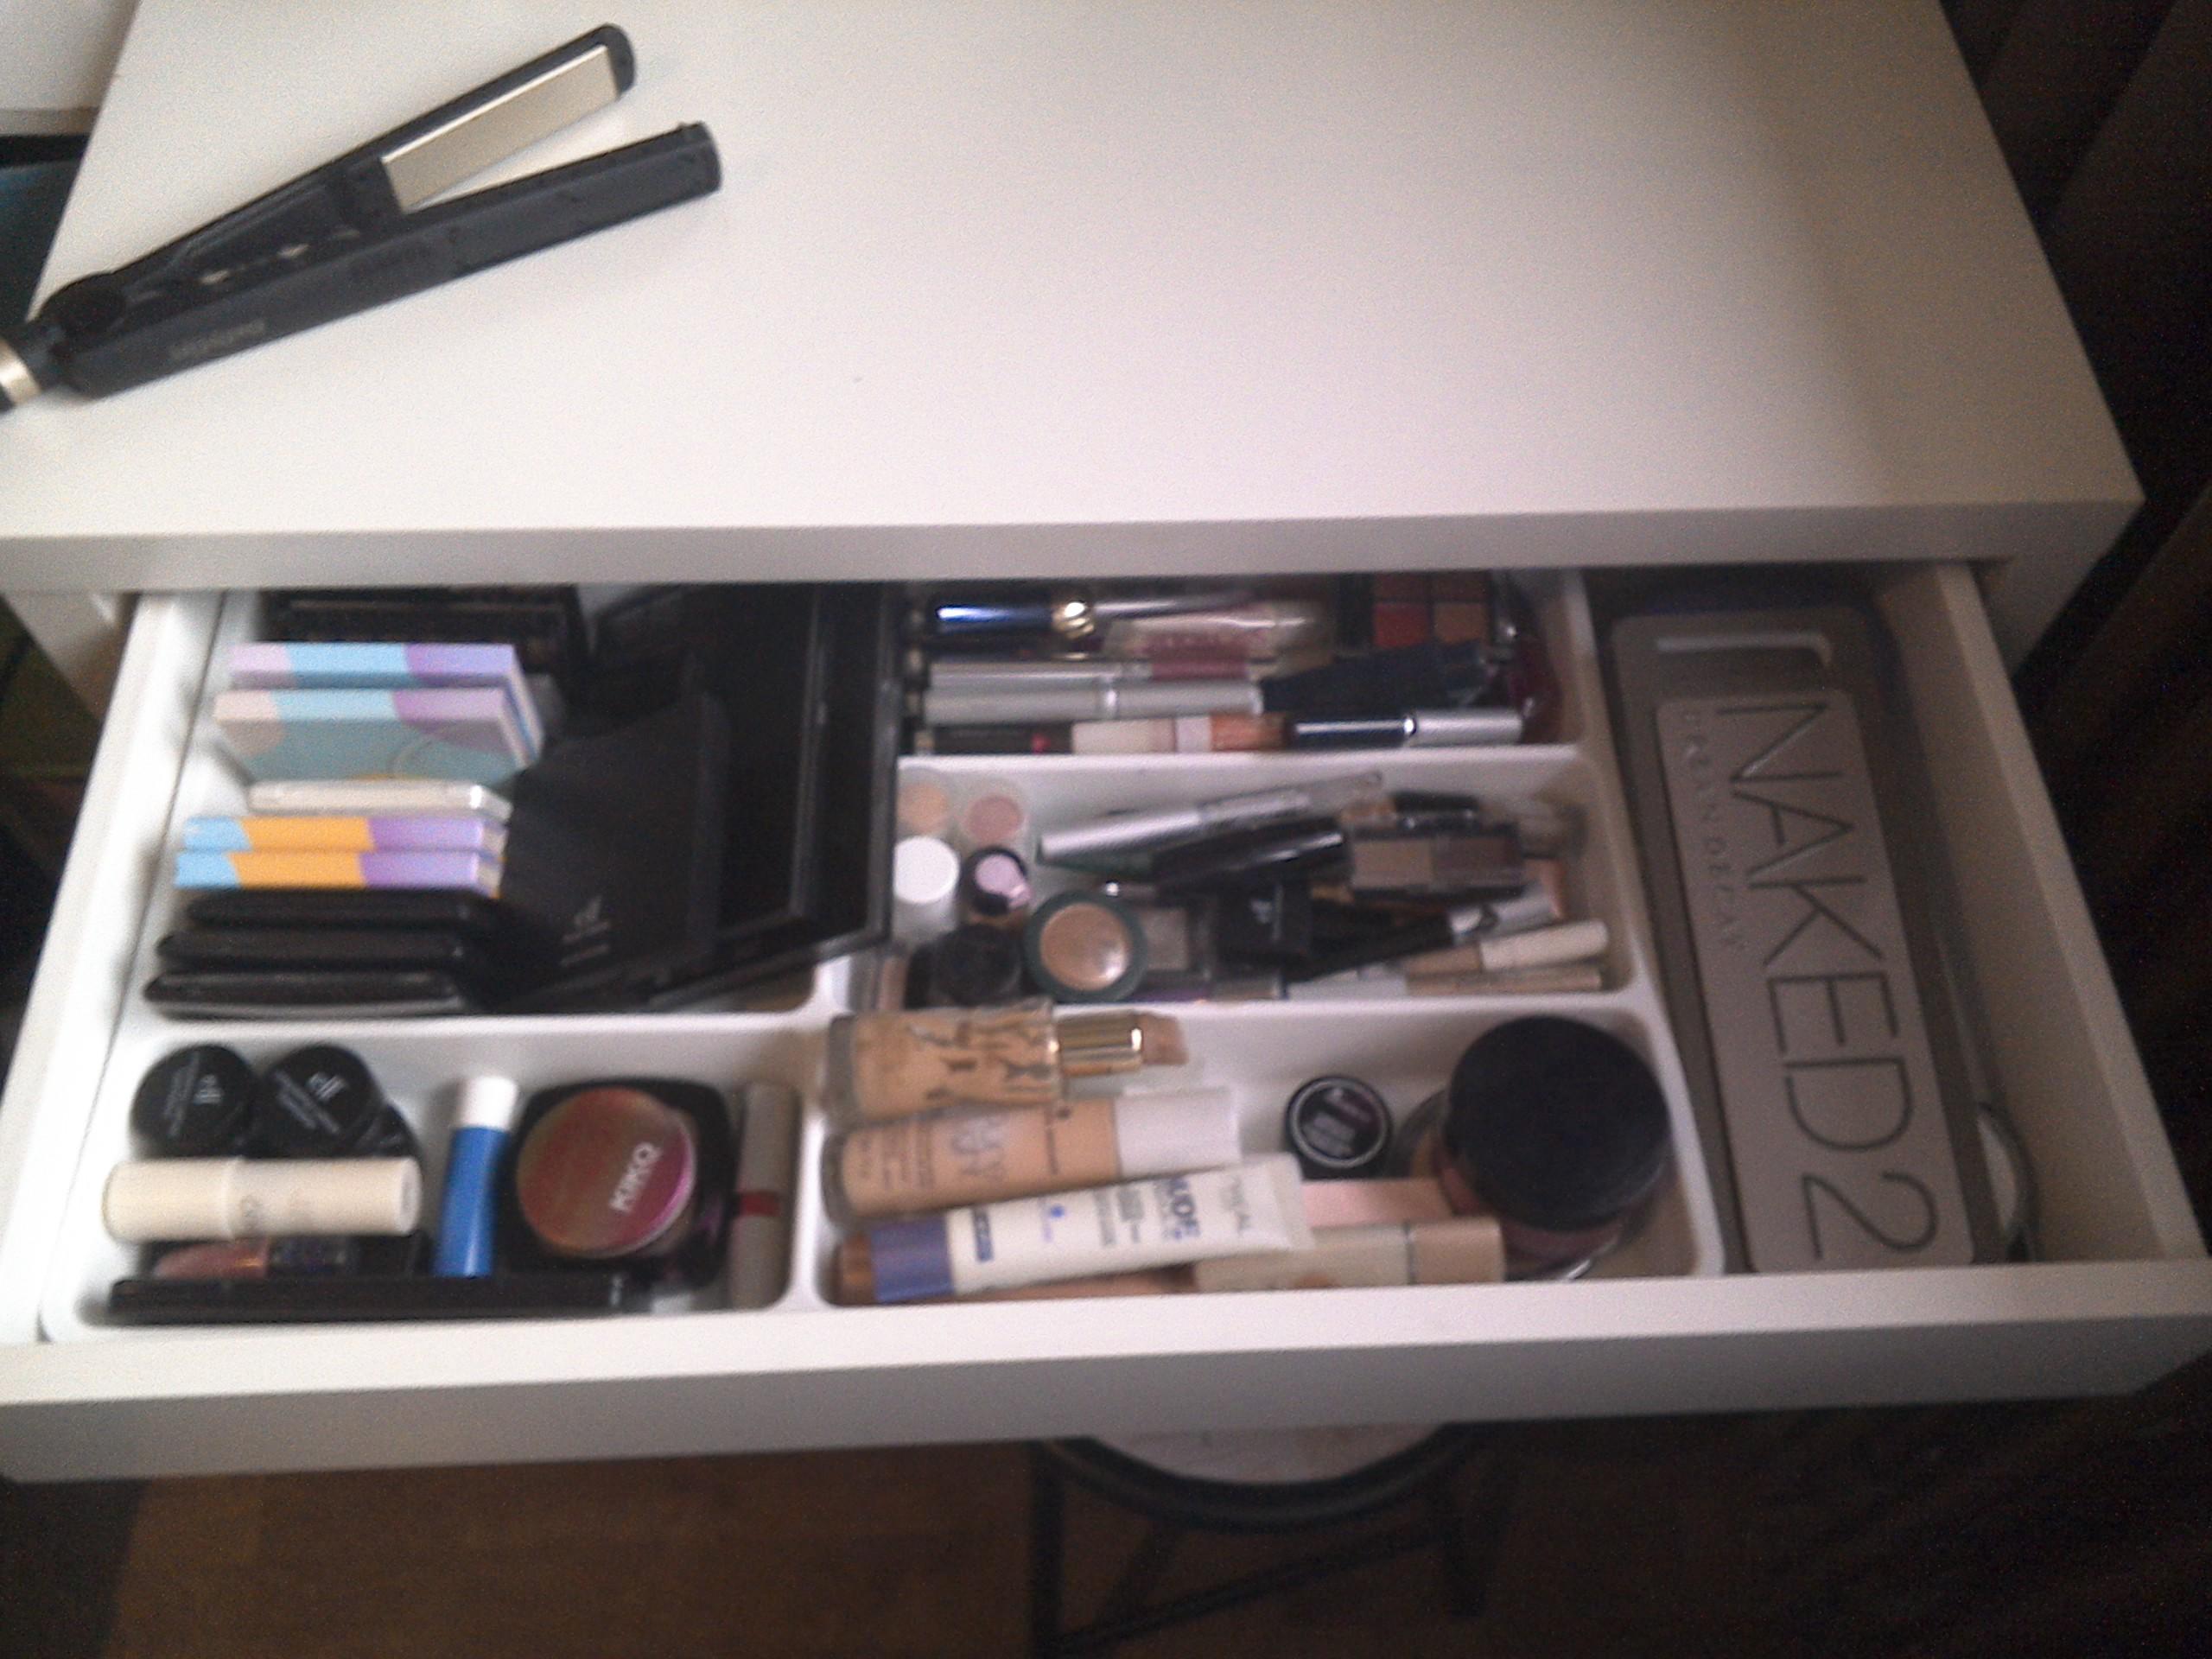 Conseil rangement make up thebeautycompany - Boite rangement maquillage ikea ...